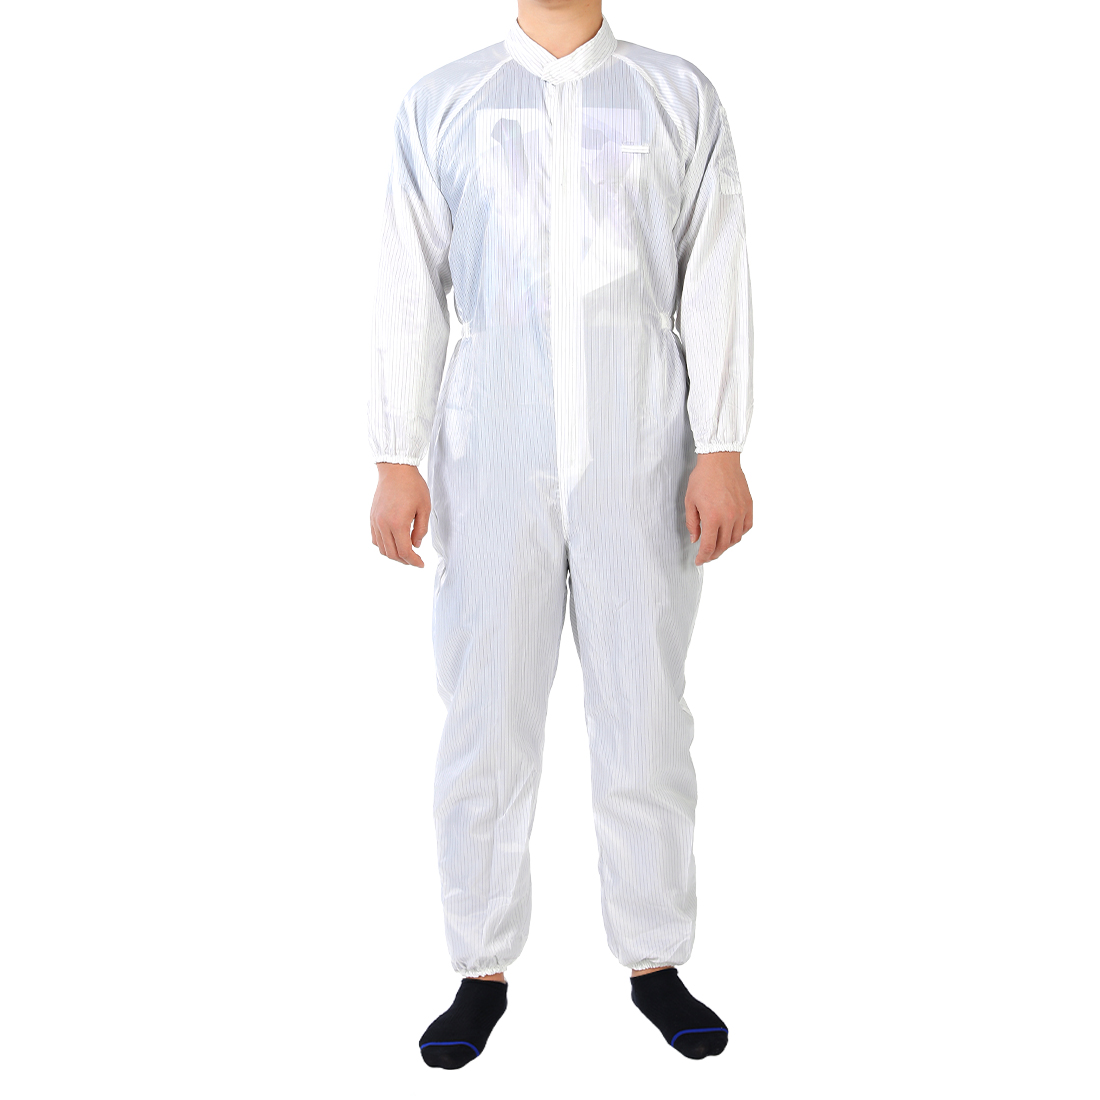 Anti Static Overalls Siamese Unisex ESD Lab Coat Button Up M White